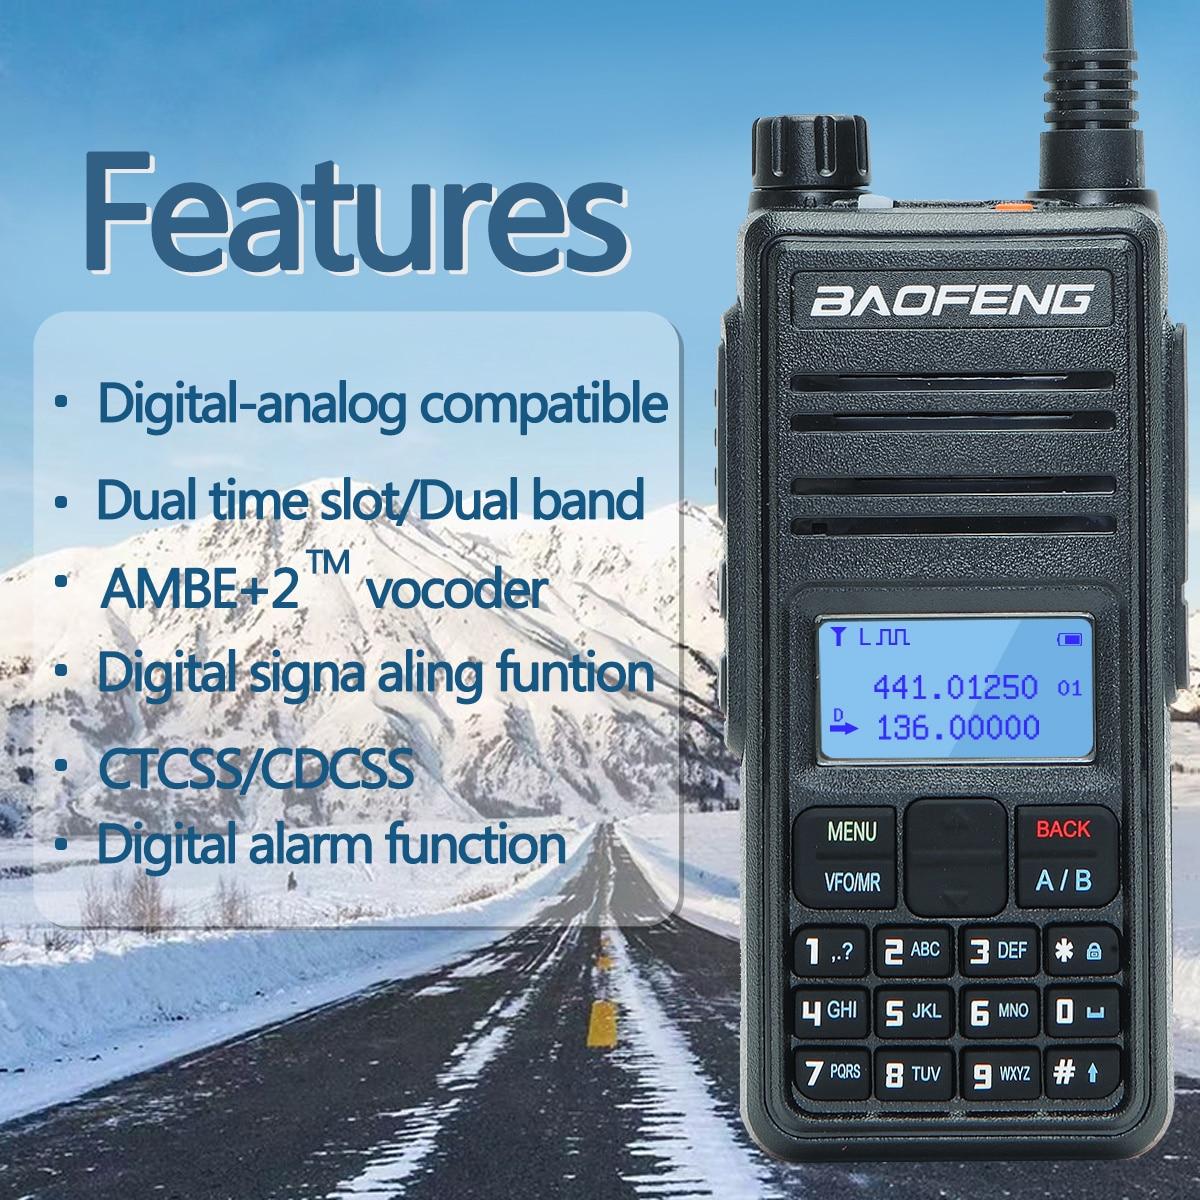 2021 New Baofeng DM-1801A Dual Time Slot DMR Tier I&II Radio Digital Analog136-174/400-470MHz Walkie Talkie Hunting DM-5R DM-860 enlarge